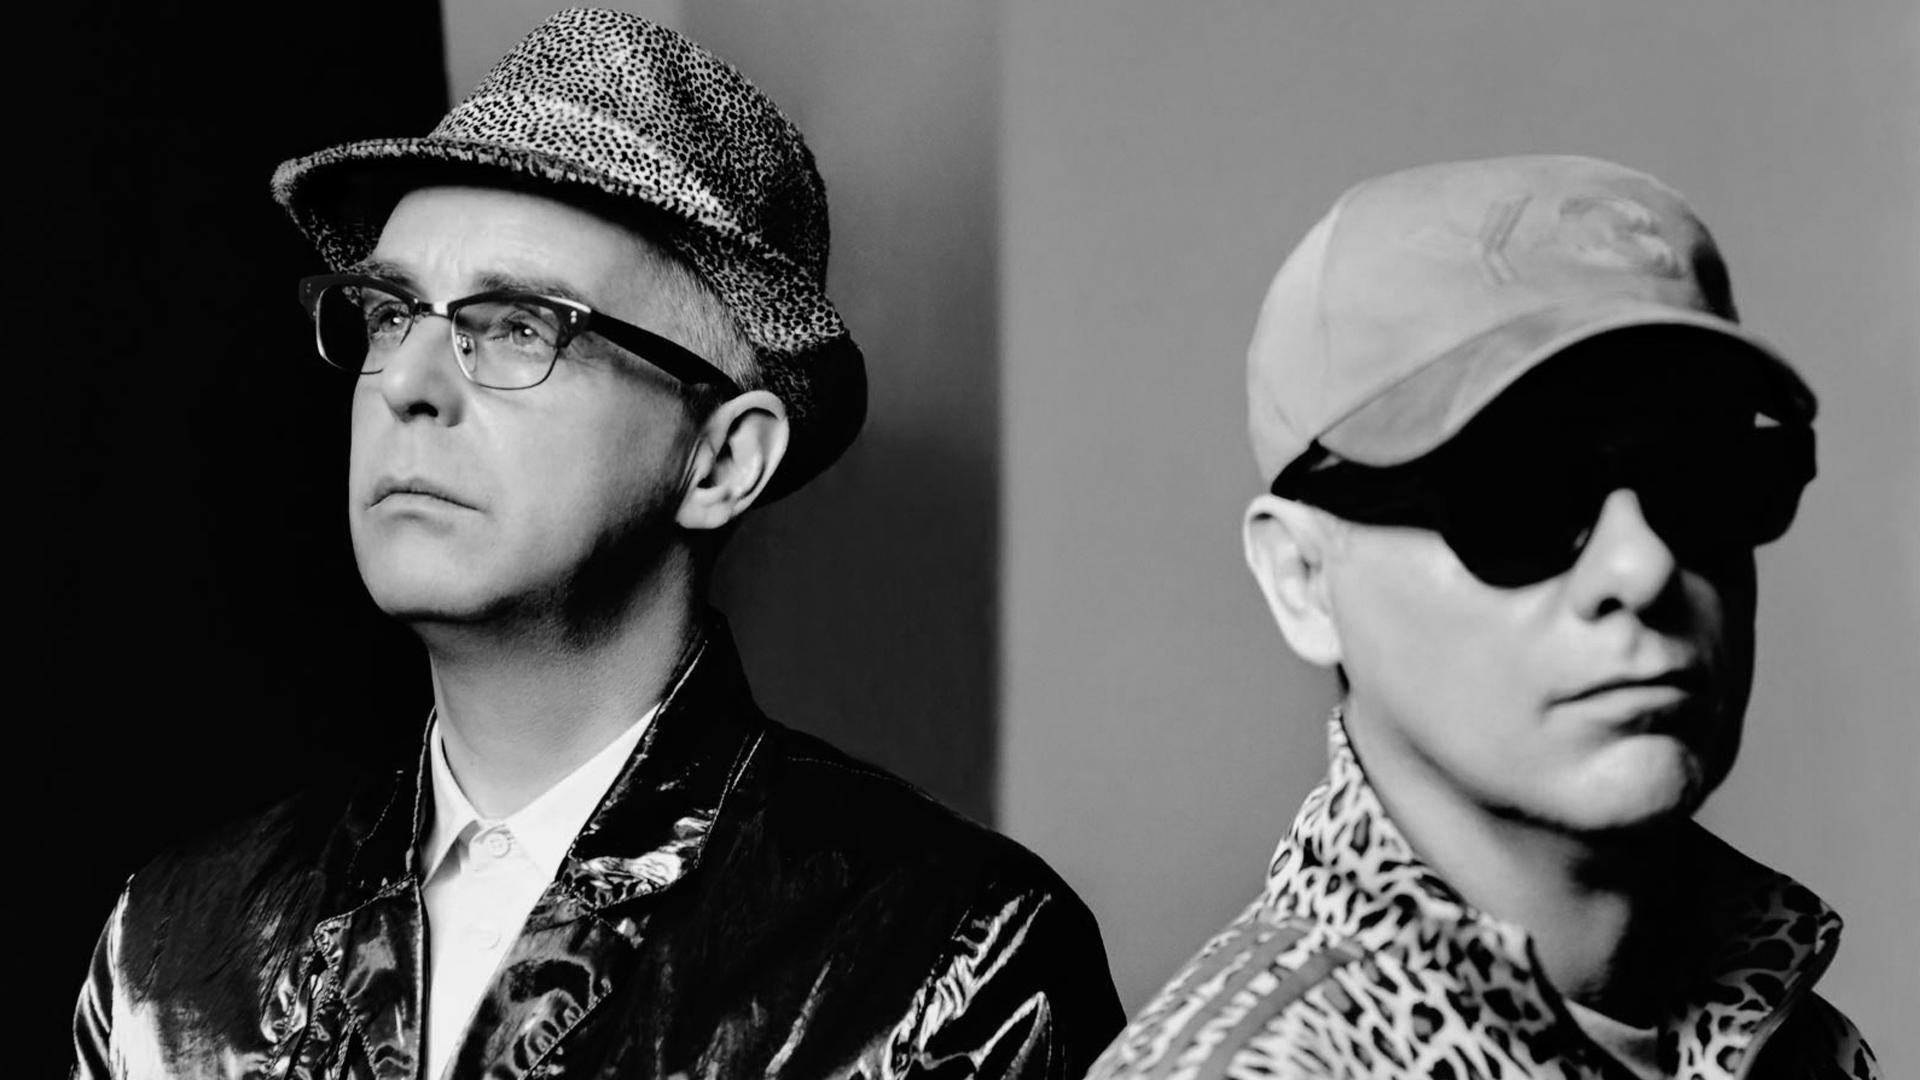 Girl And Guitar Wallpaper 1 Pet Shop Boys Hd Wallpapers Backgrounds Wallpaper Abyss